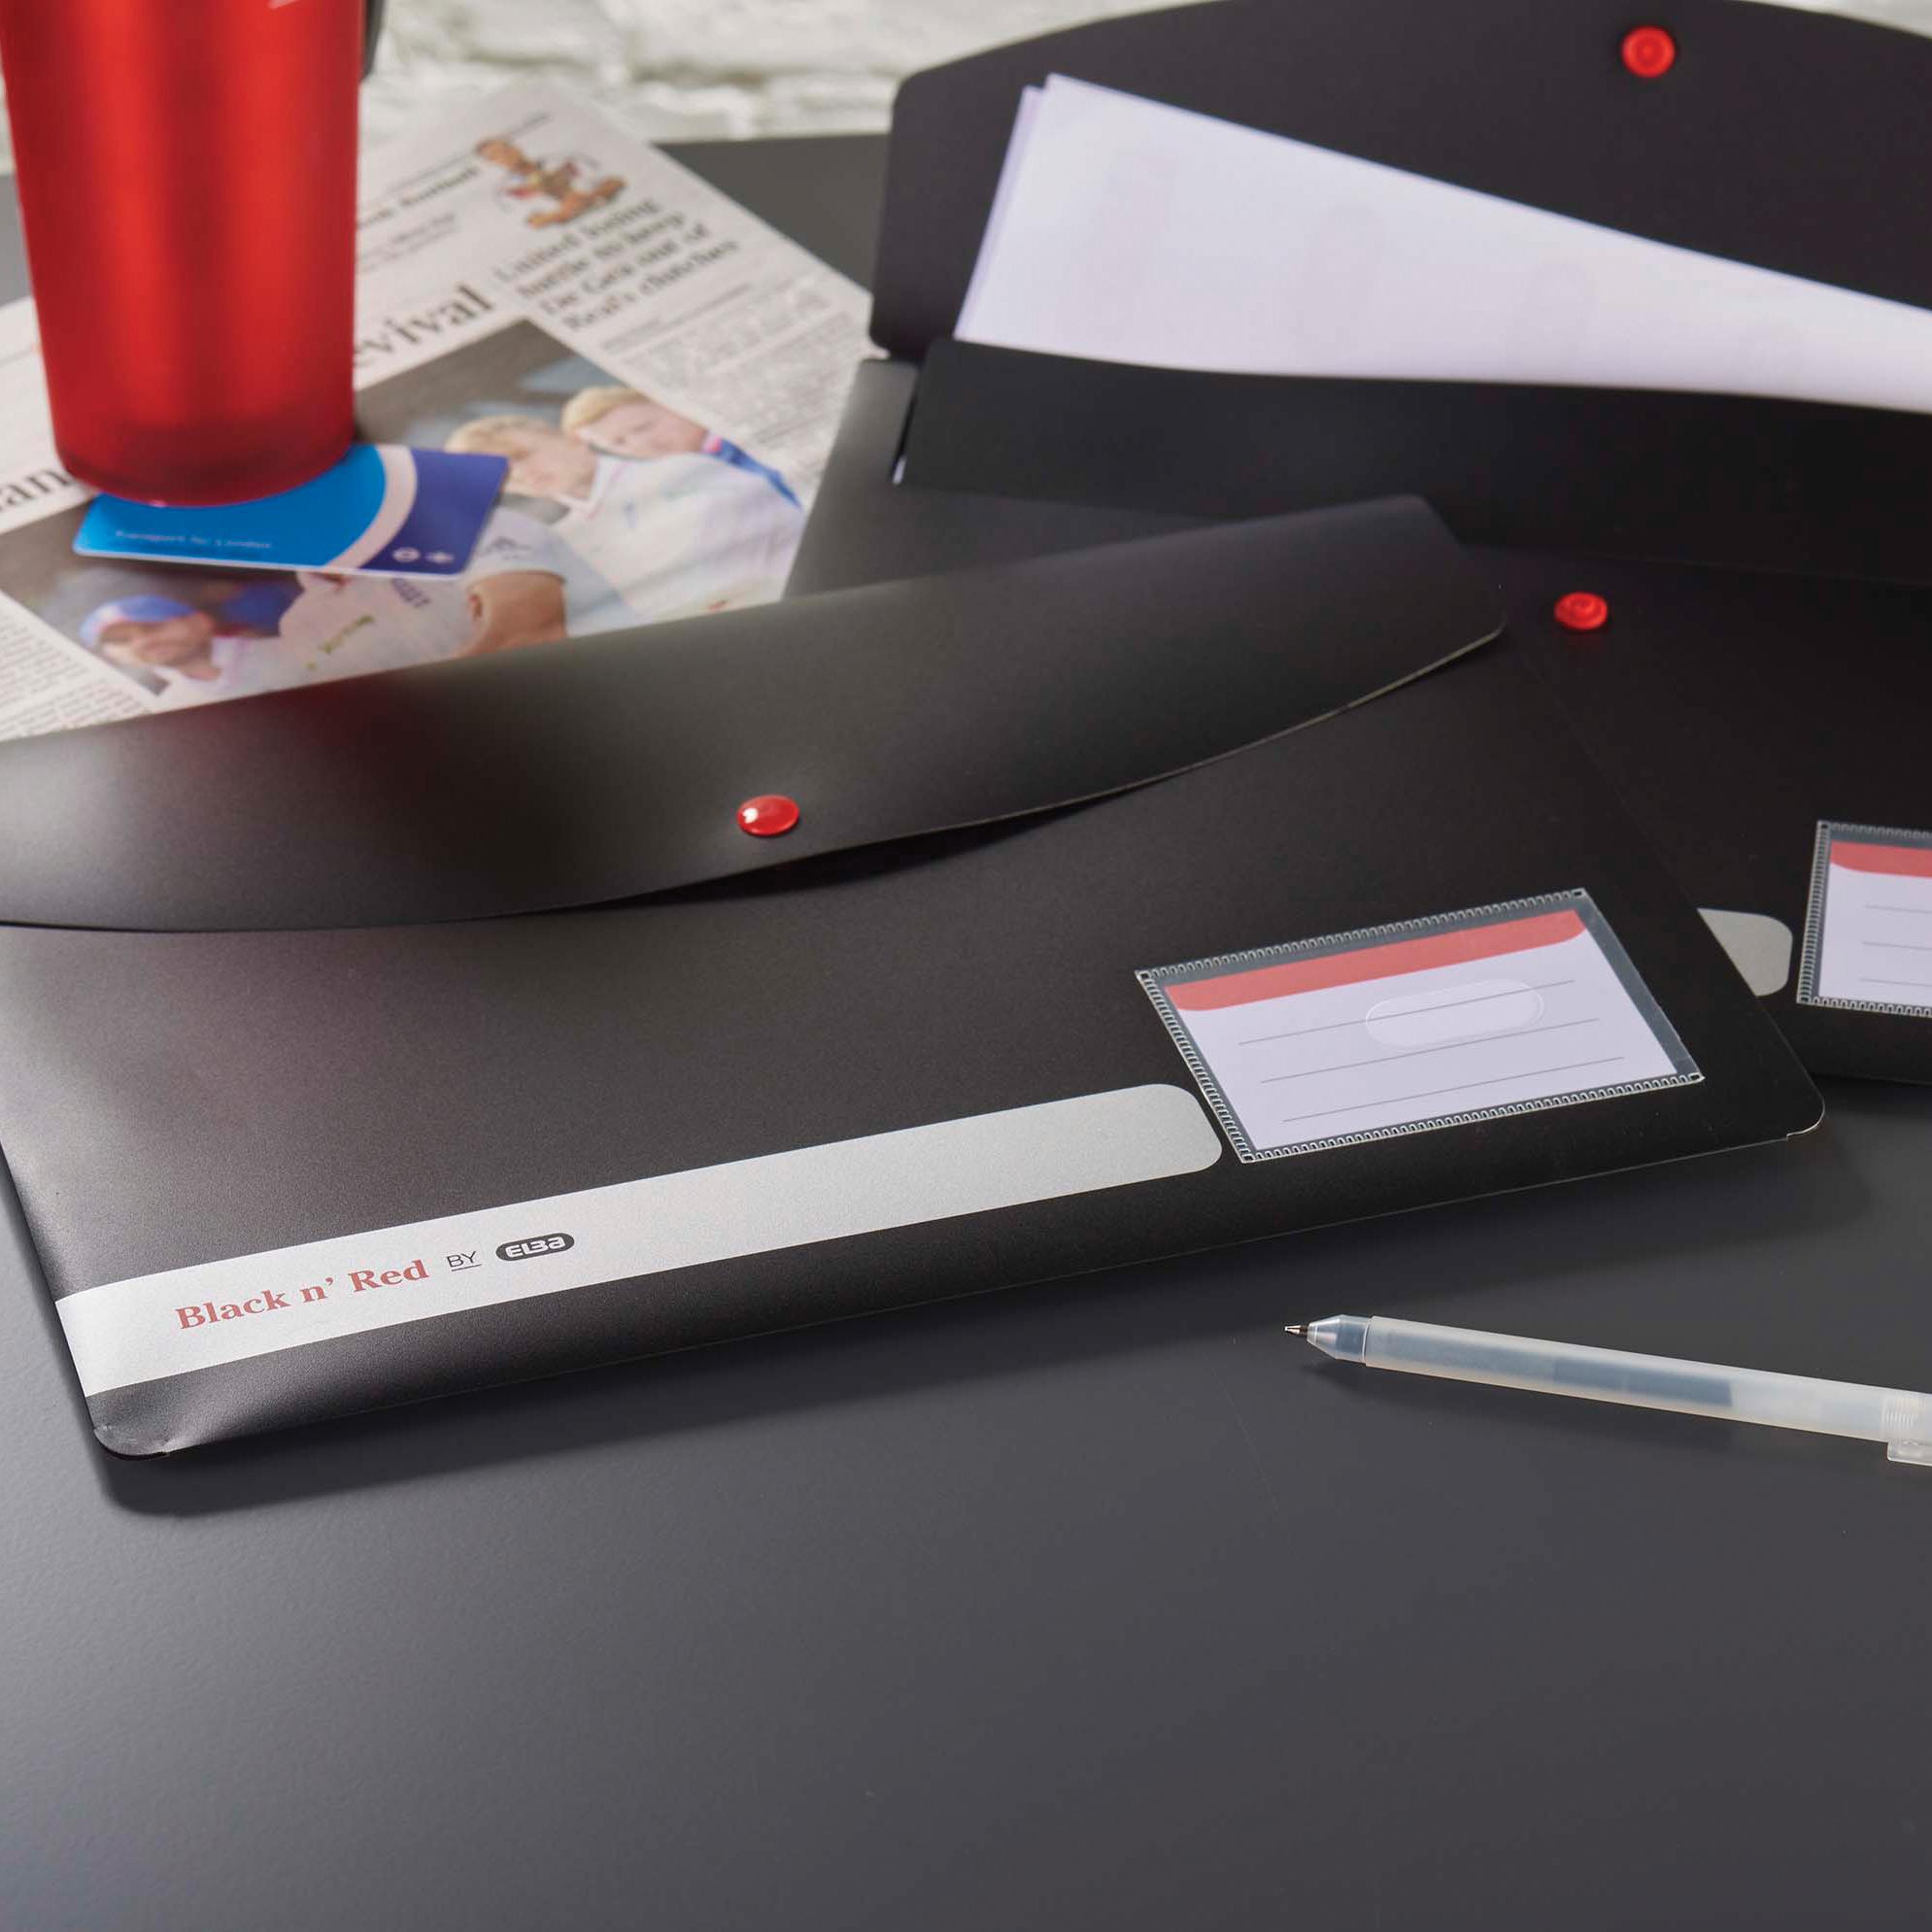 Black n Red by Elba Stud Wallet Polypropylene A4 Opaque Ref 400051532 [Pack 5]